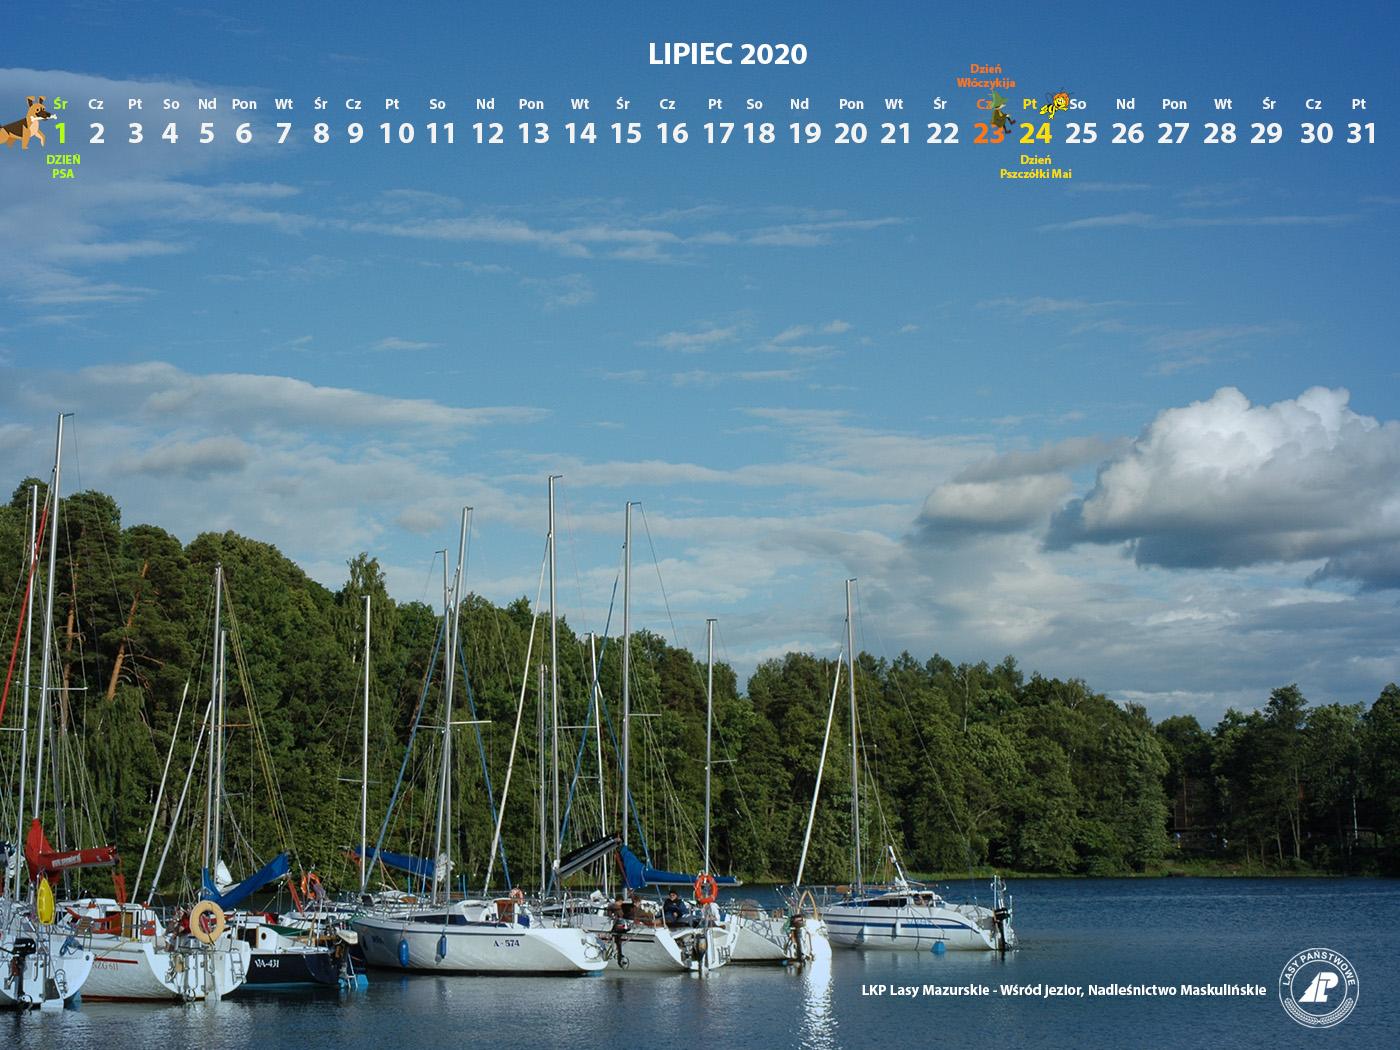 Kalendarz_lipiec_2020_1400x1050[1].jpg